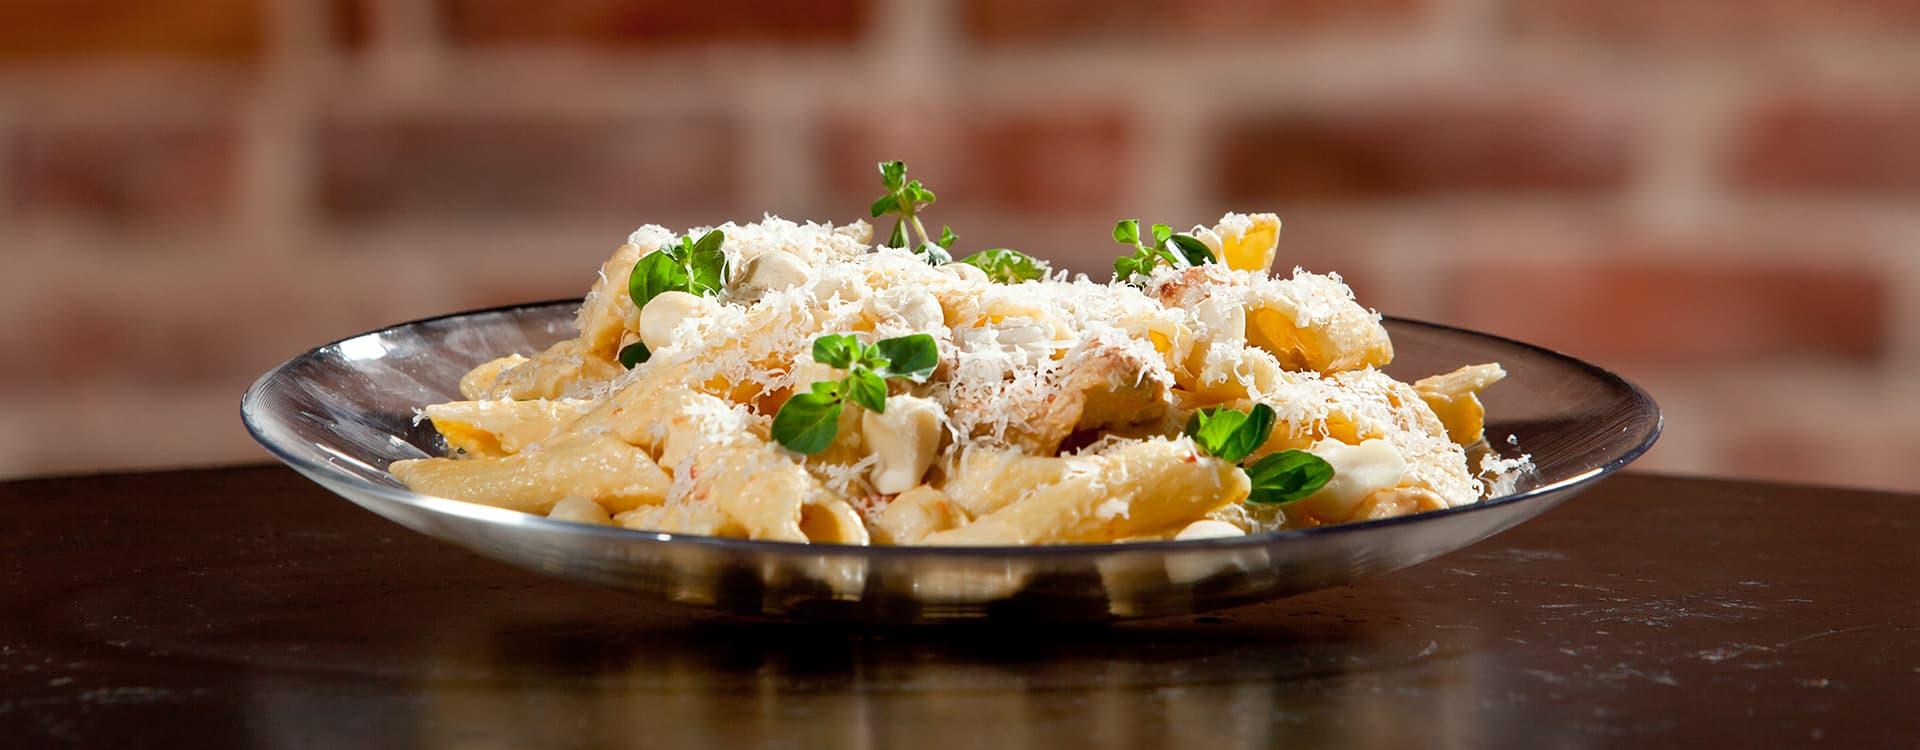 Kylling og pasta med macadamianøtter.